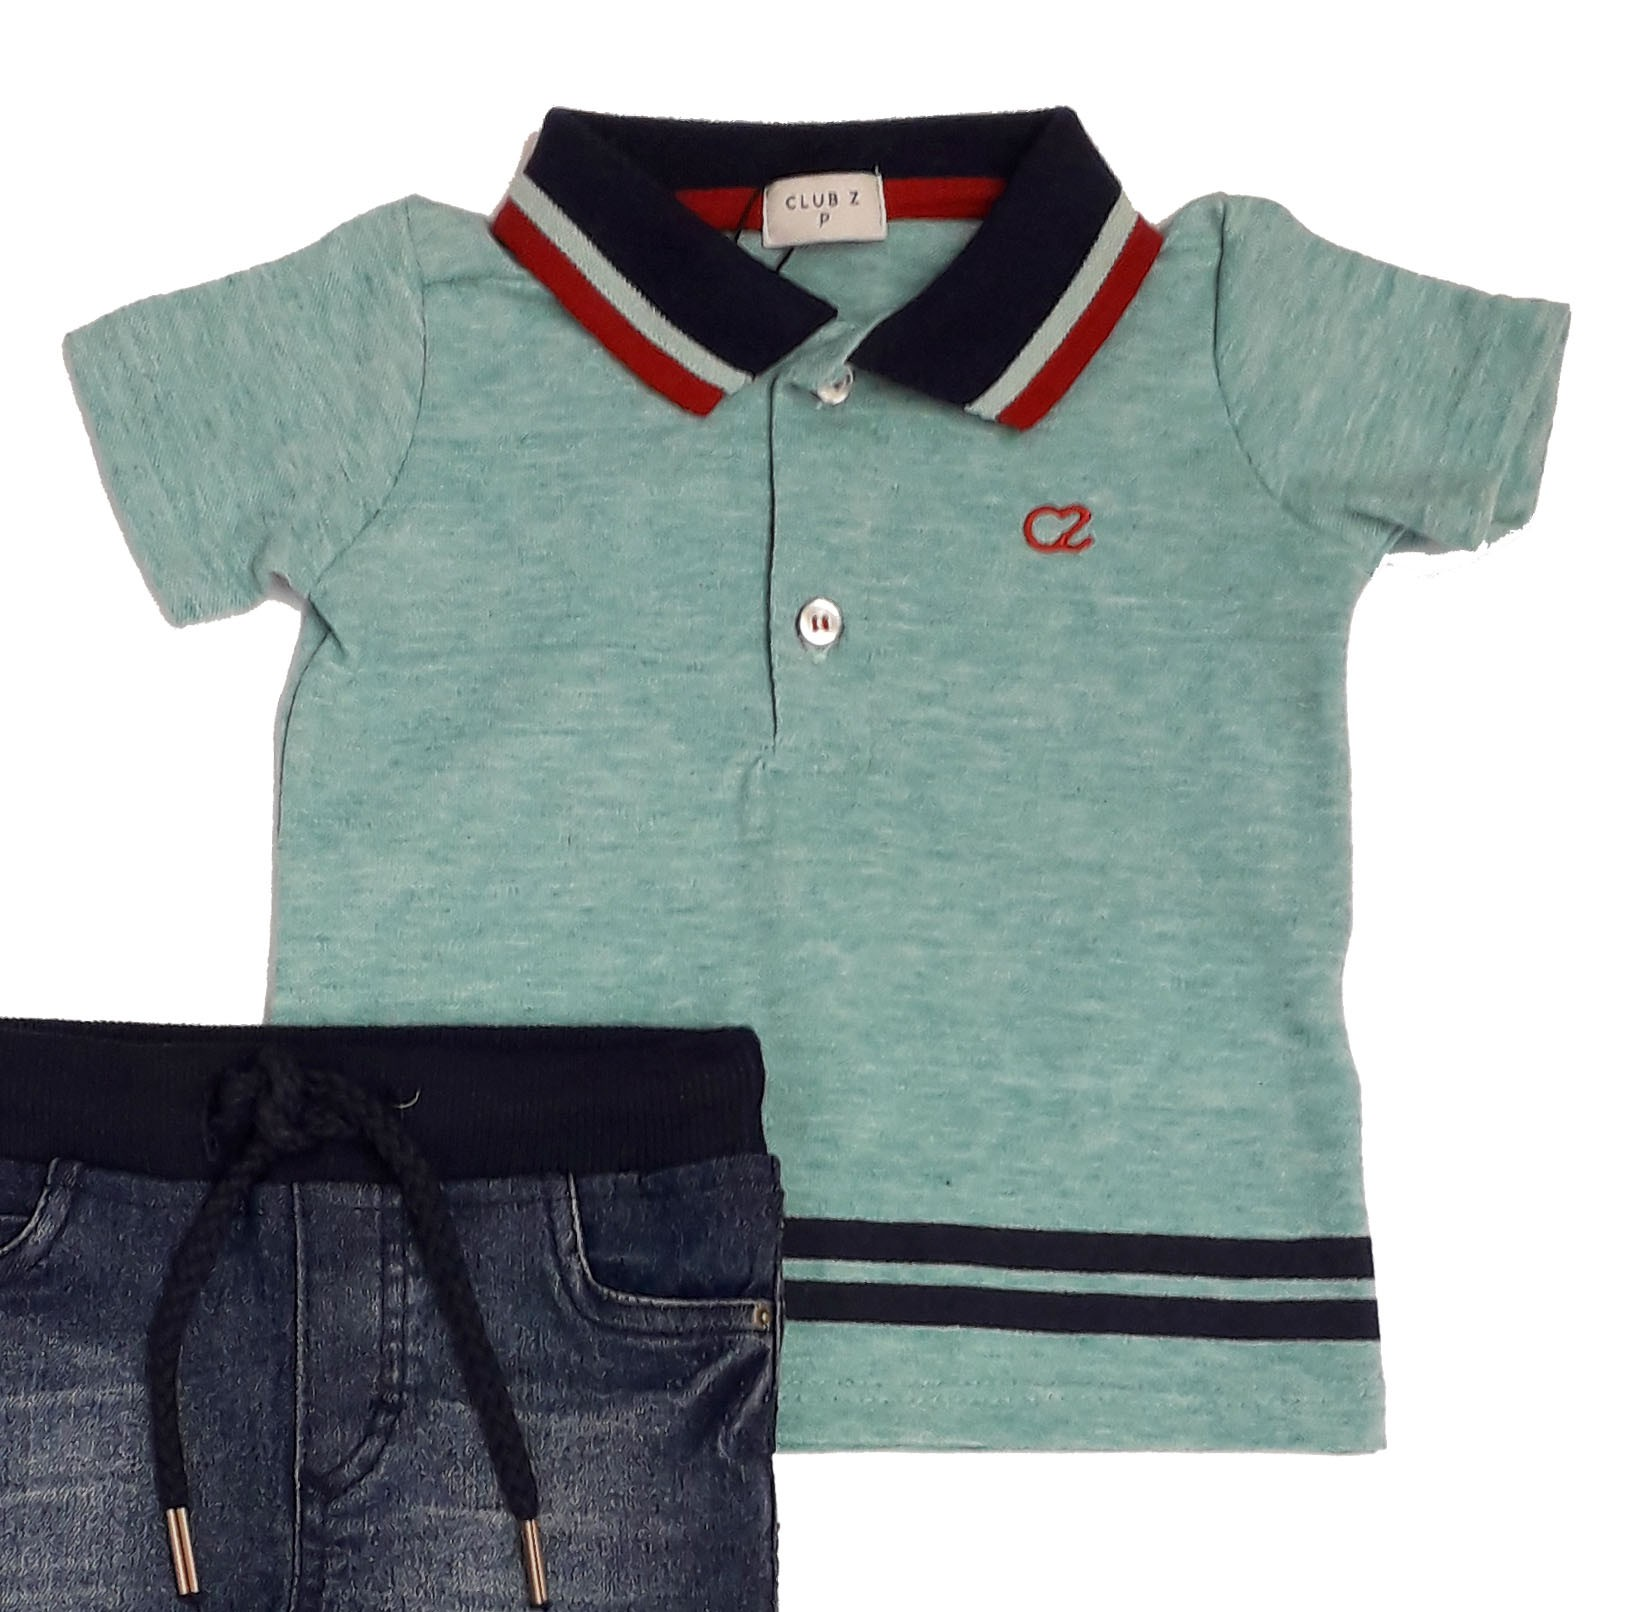 Conjunto Infantil Masculino Polo Verde e Calça Jeans Club Z